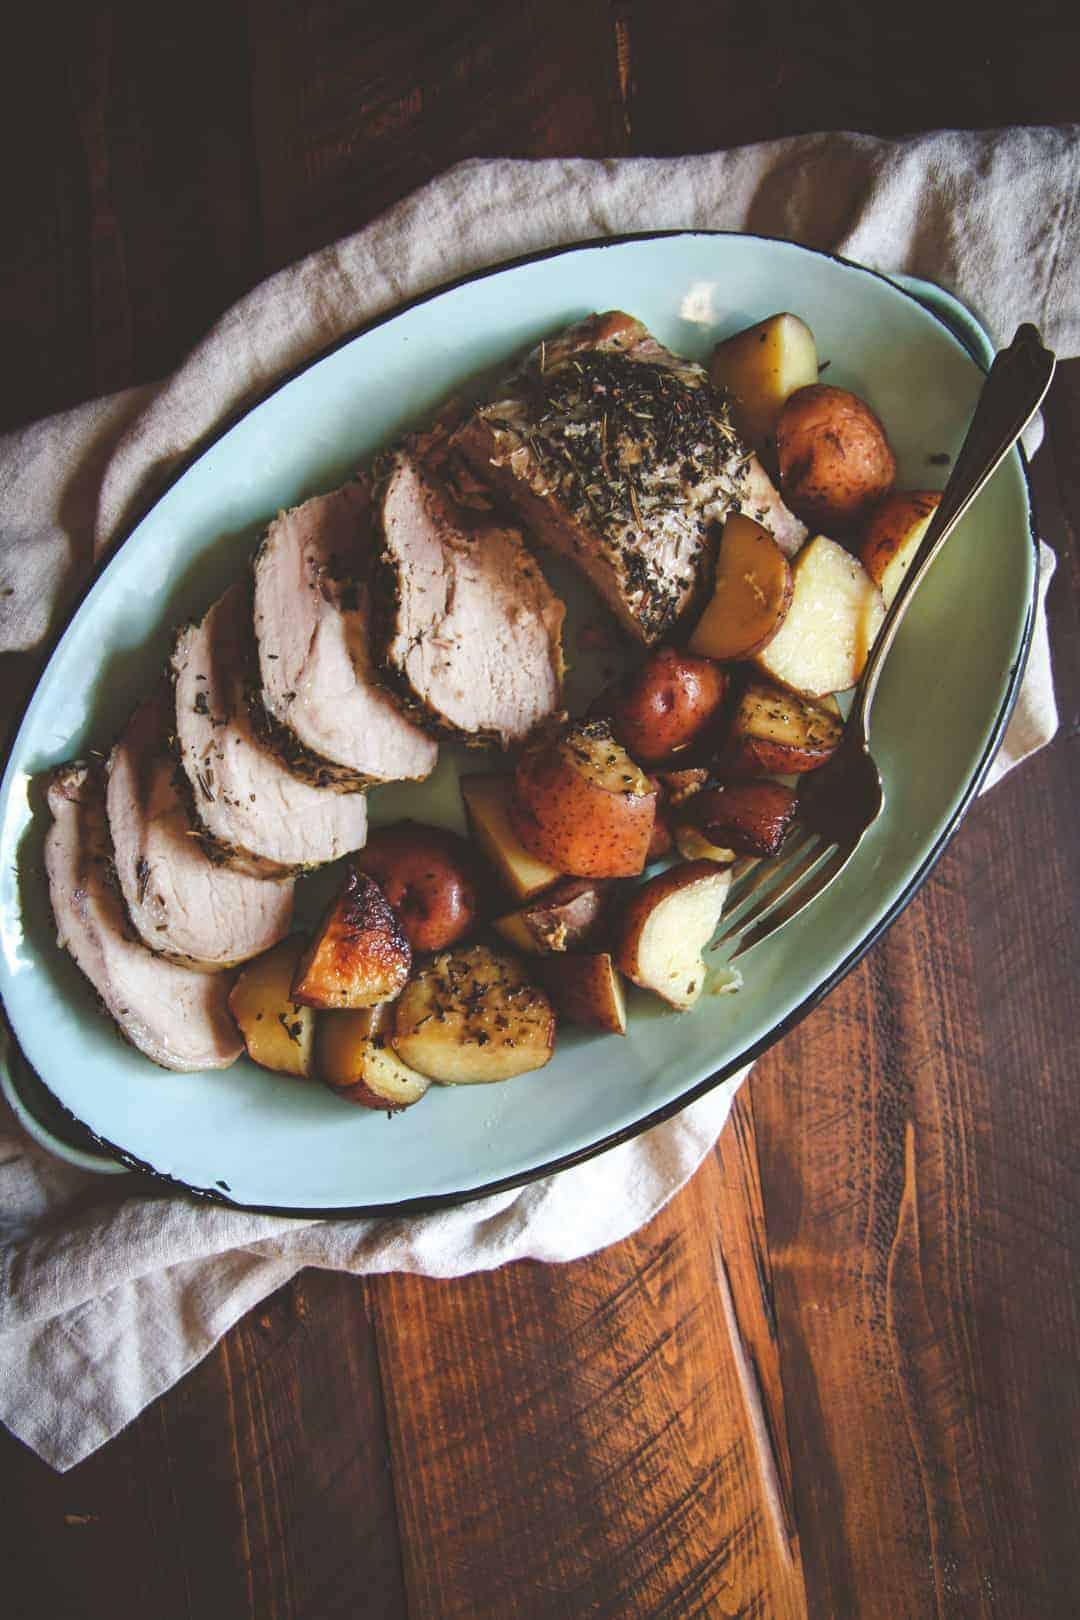 Easy Kid Friendly Slow Cooker Meals 5 Ingredient Crockpot Pork Roast And Potatoes 6